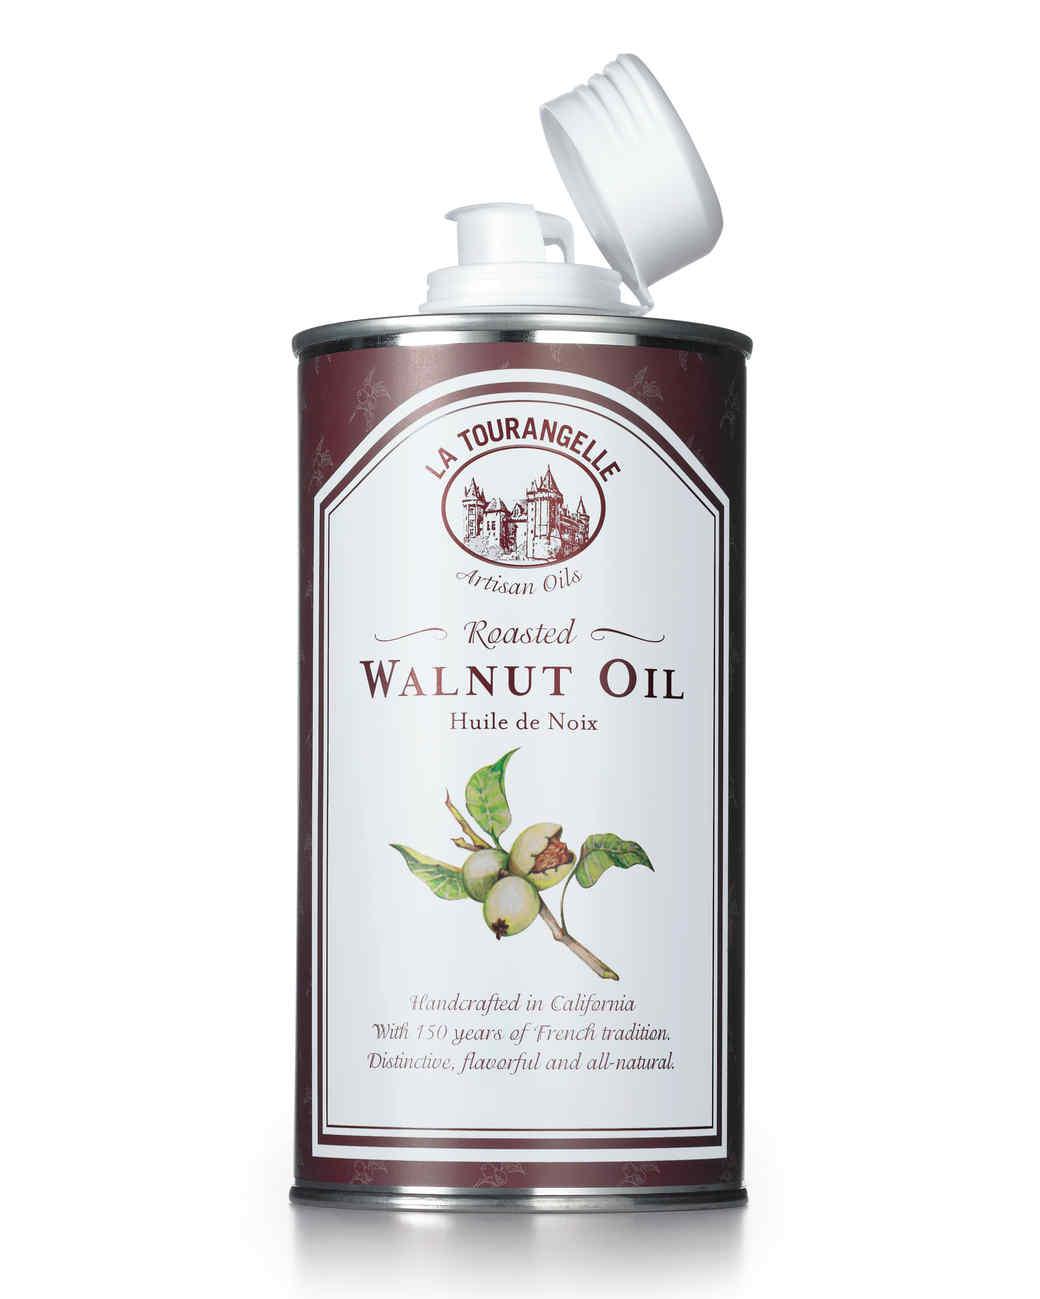 walnut-oil-020-md110599.jpg